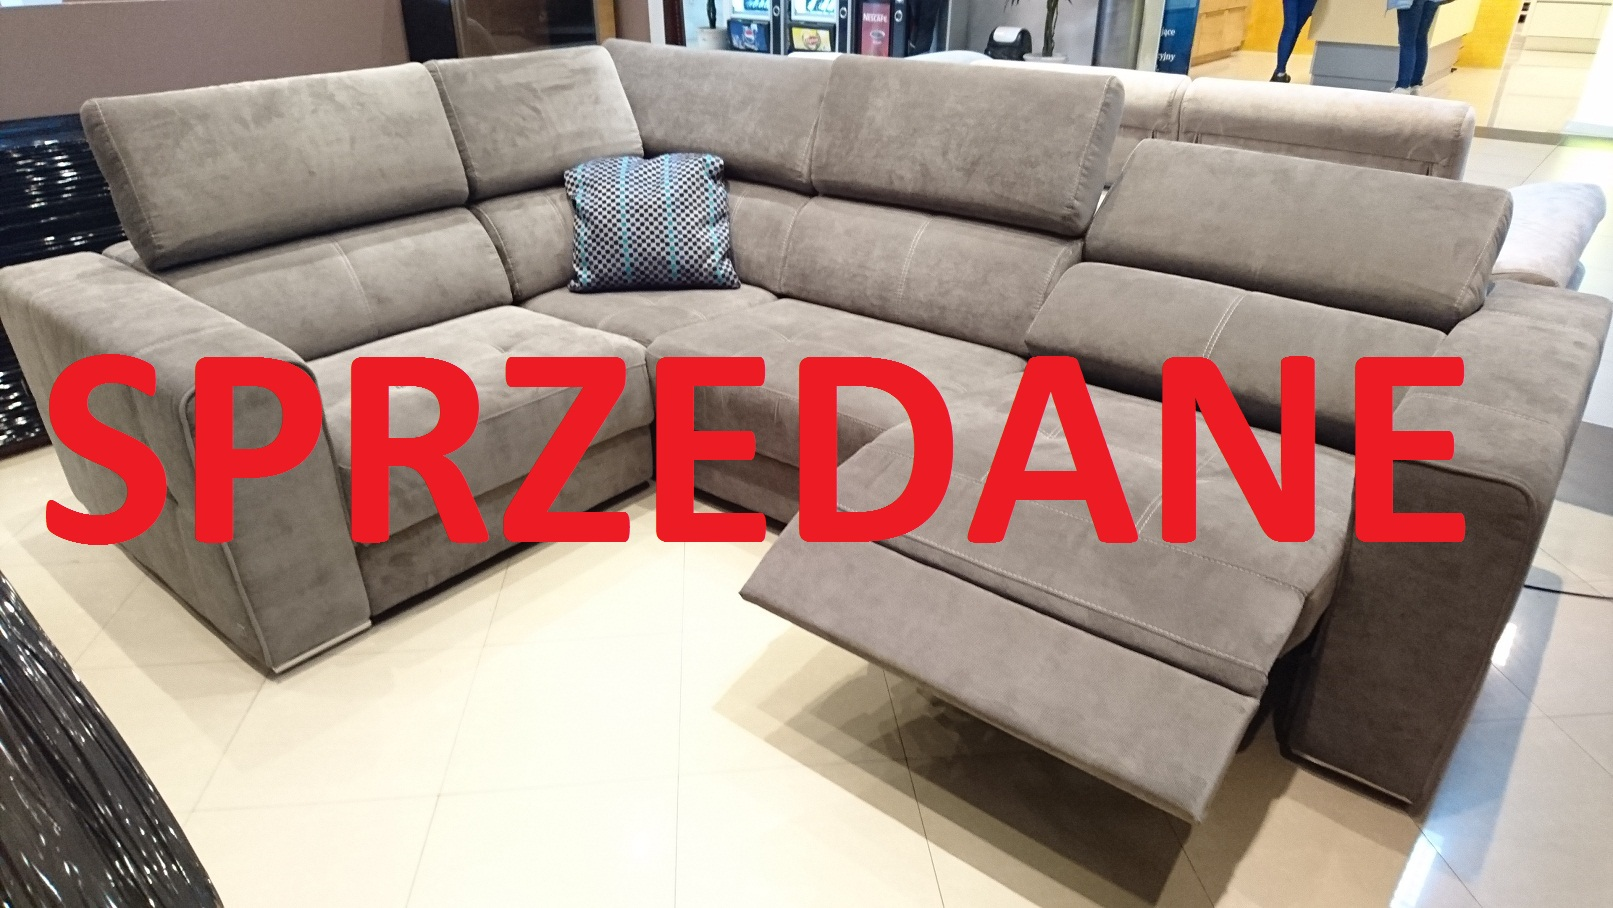 Quartz z relaksem Emmohl Warszaw Studio Komfort narożnik relaks SPRZEDANE